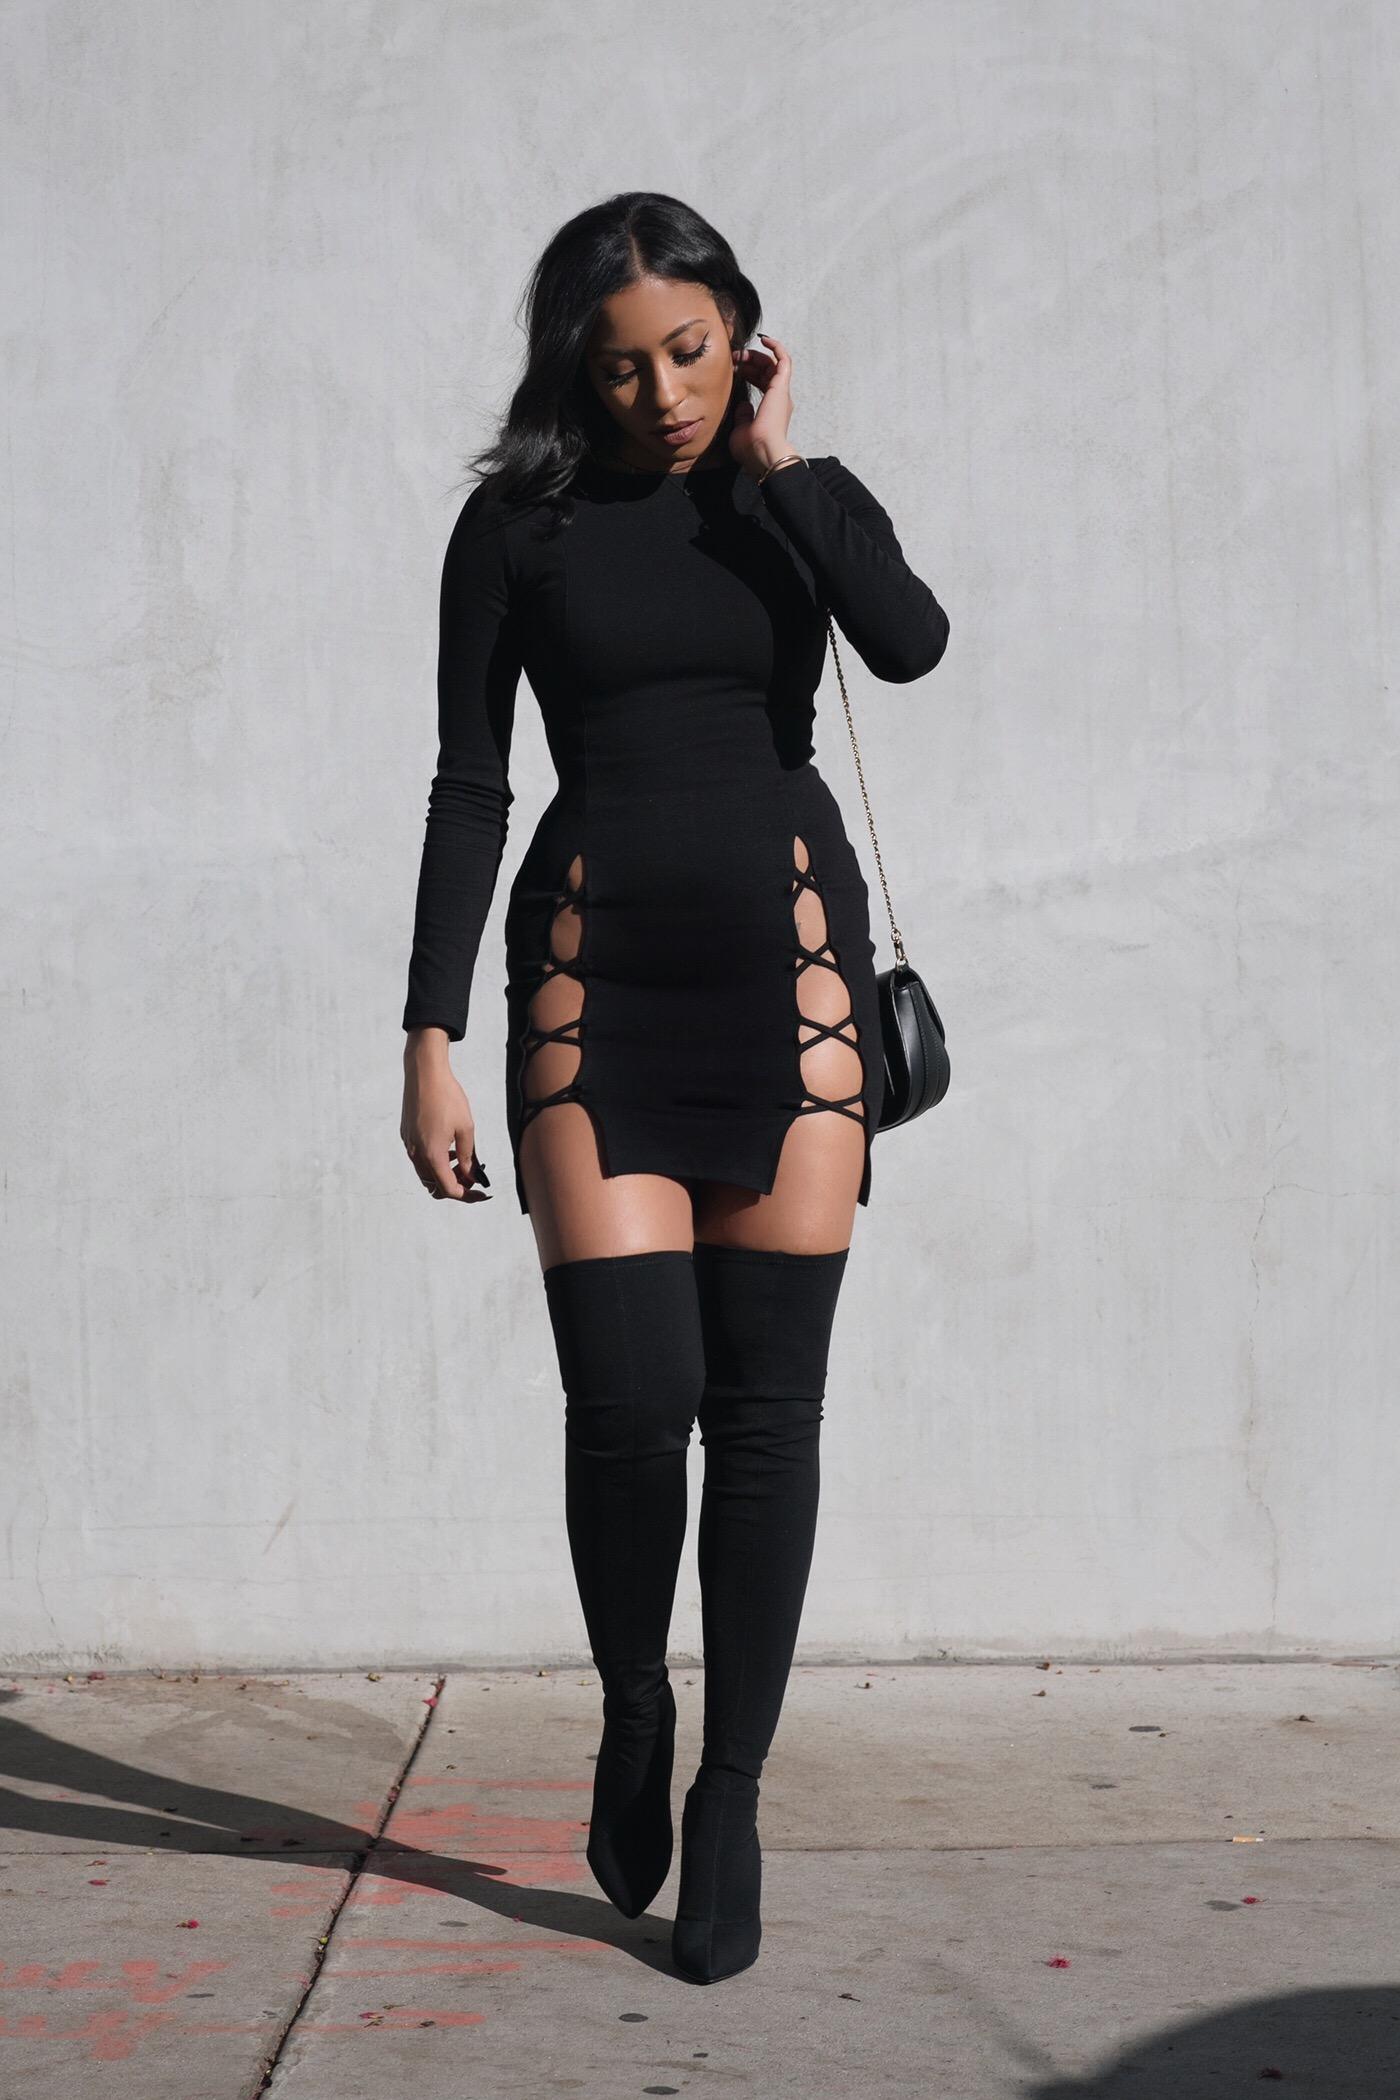 Little Black Dress, Big Black Boots